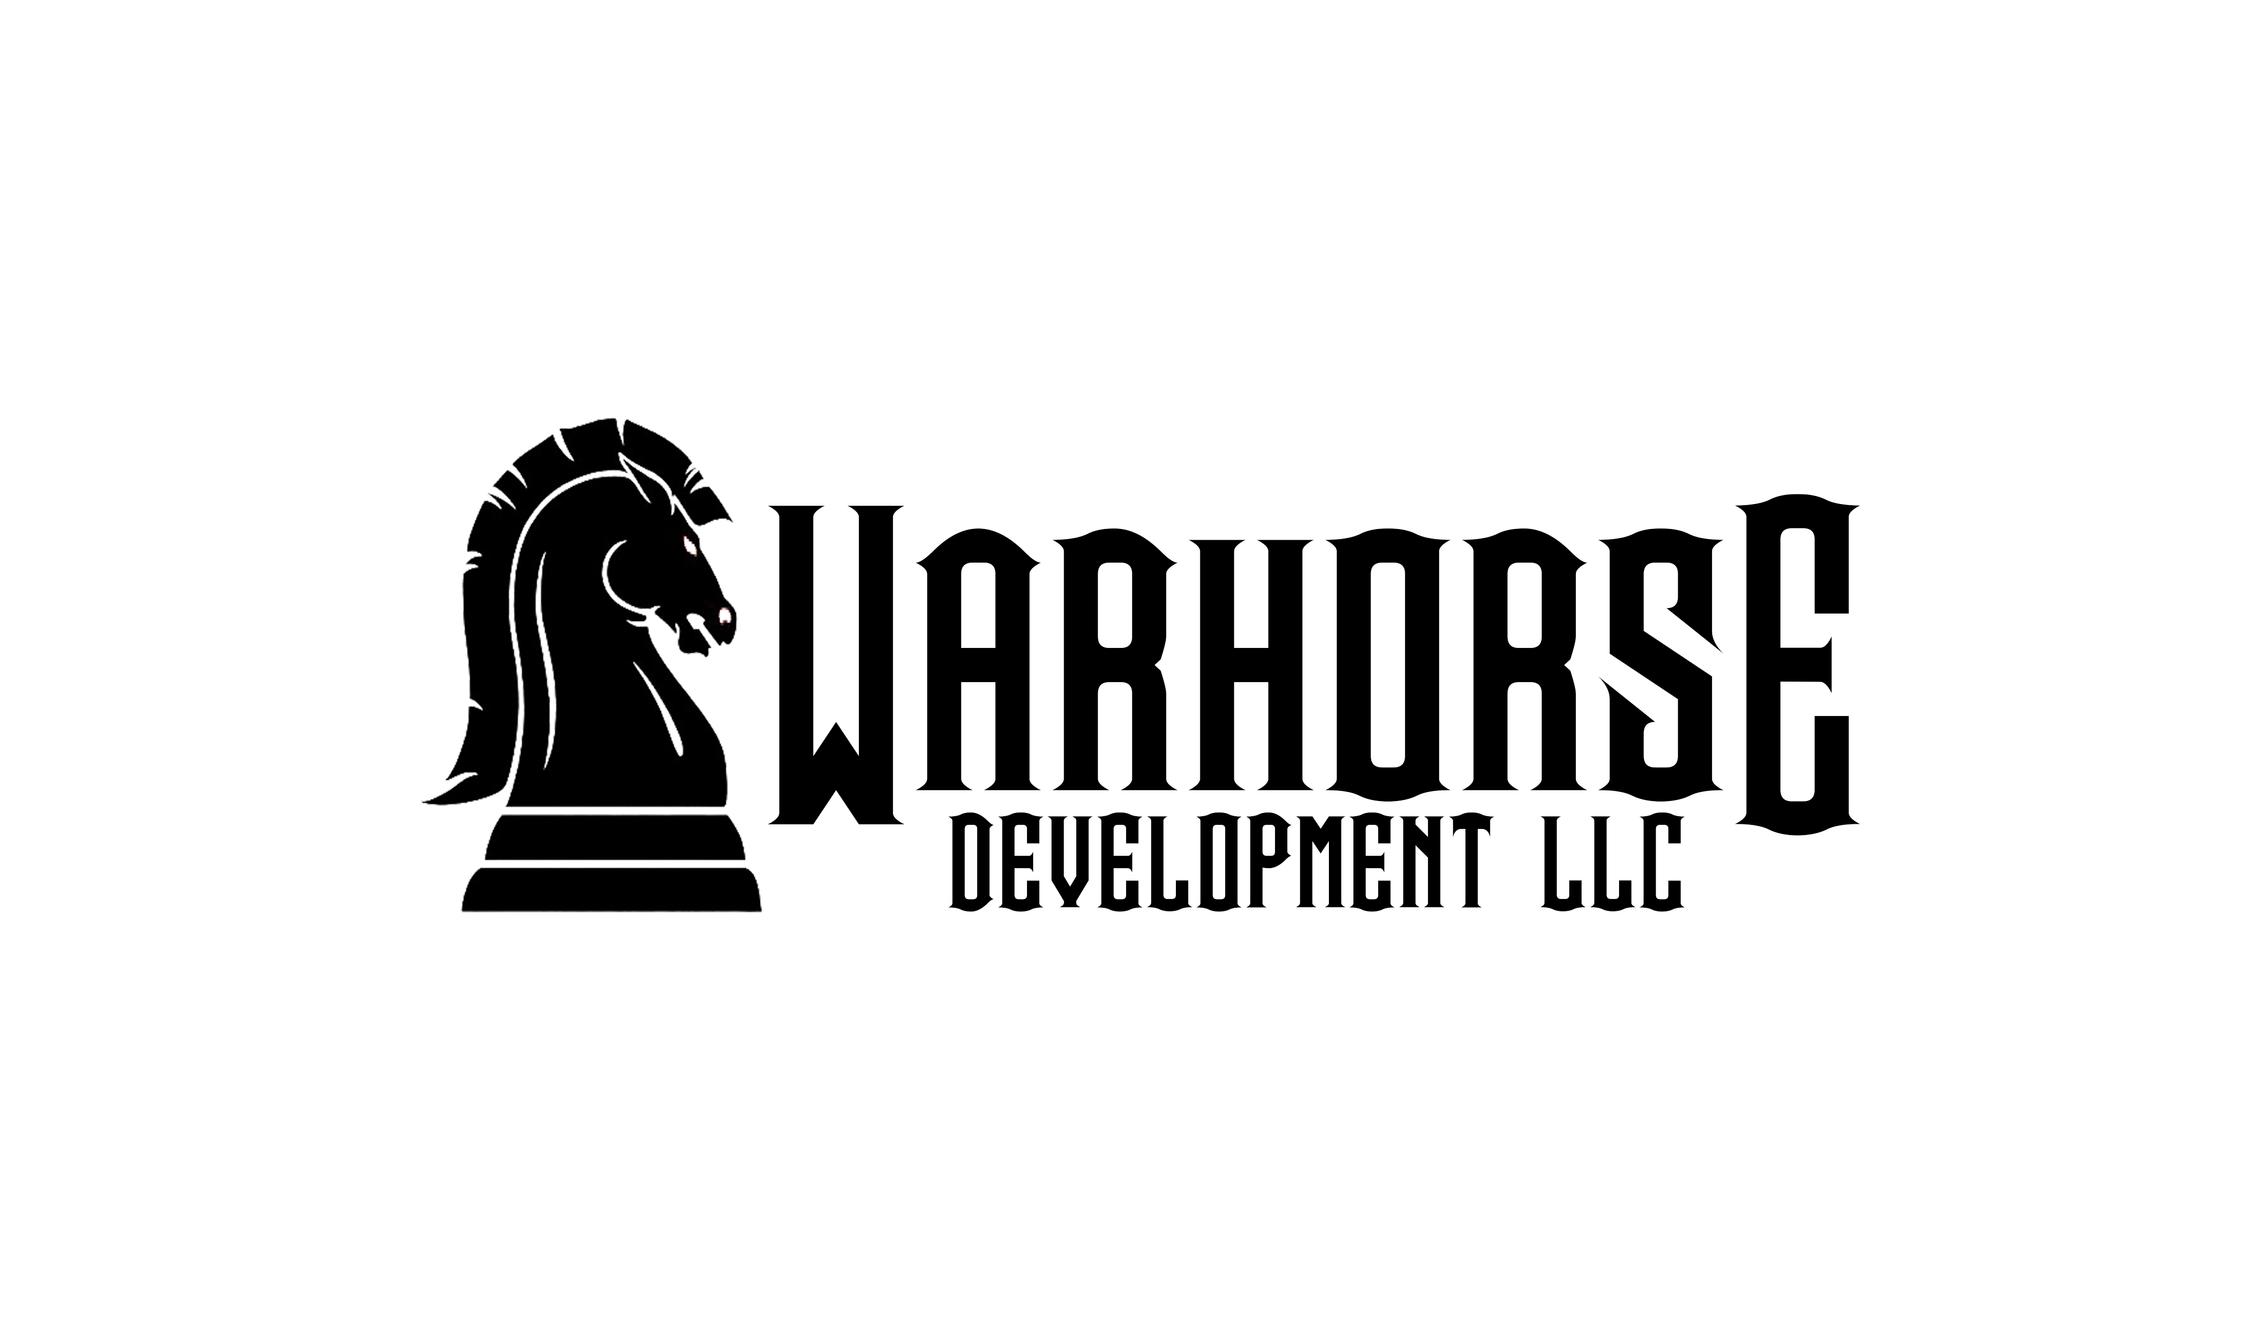 www.warhorsedevelopment.com